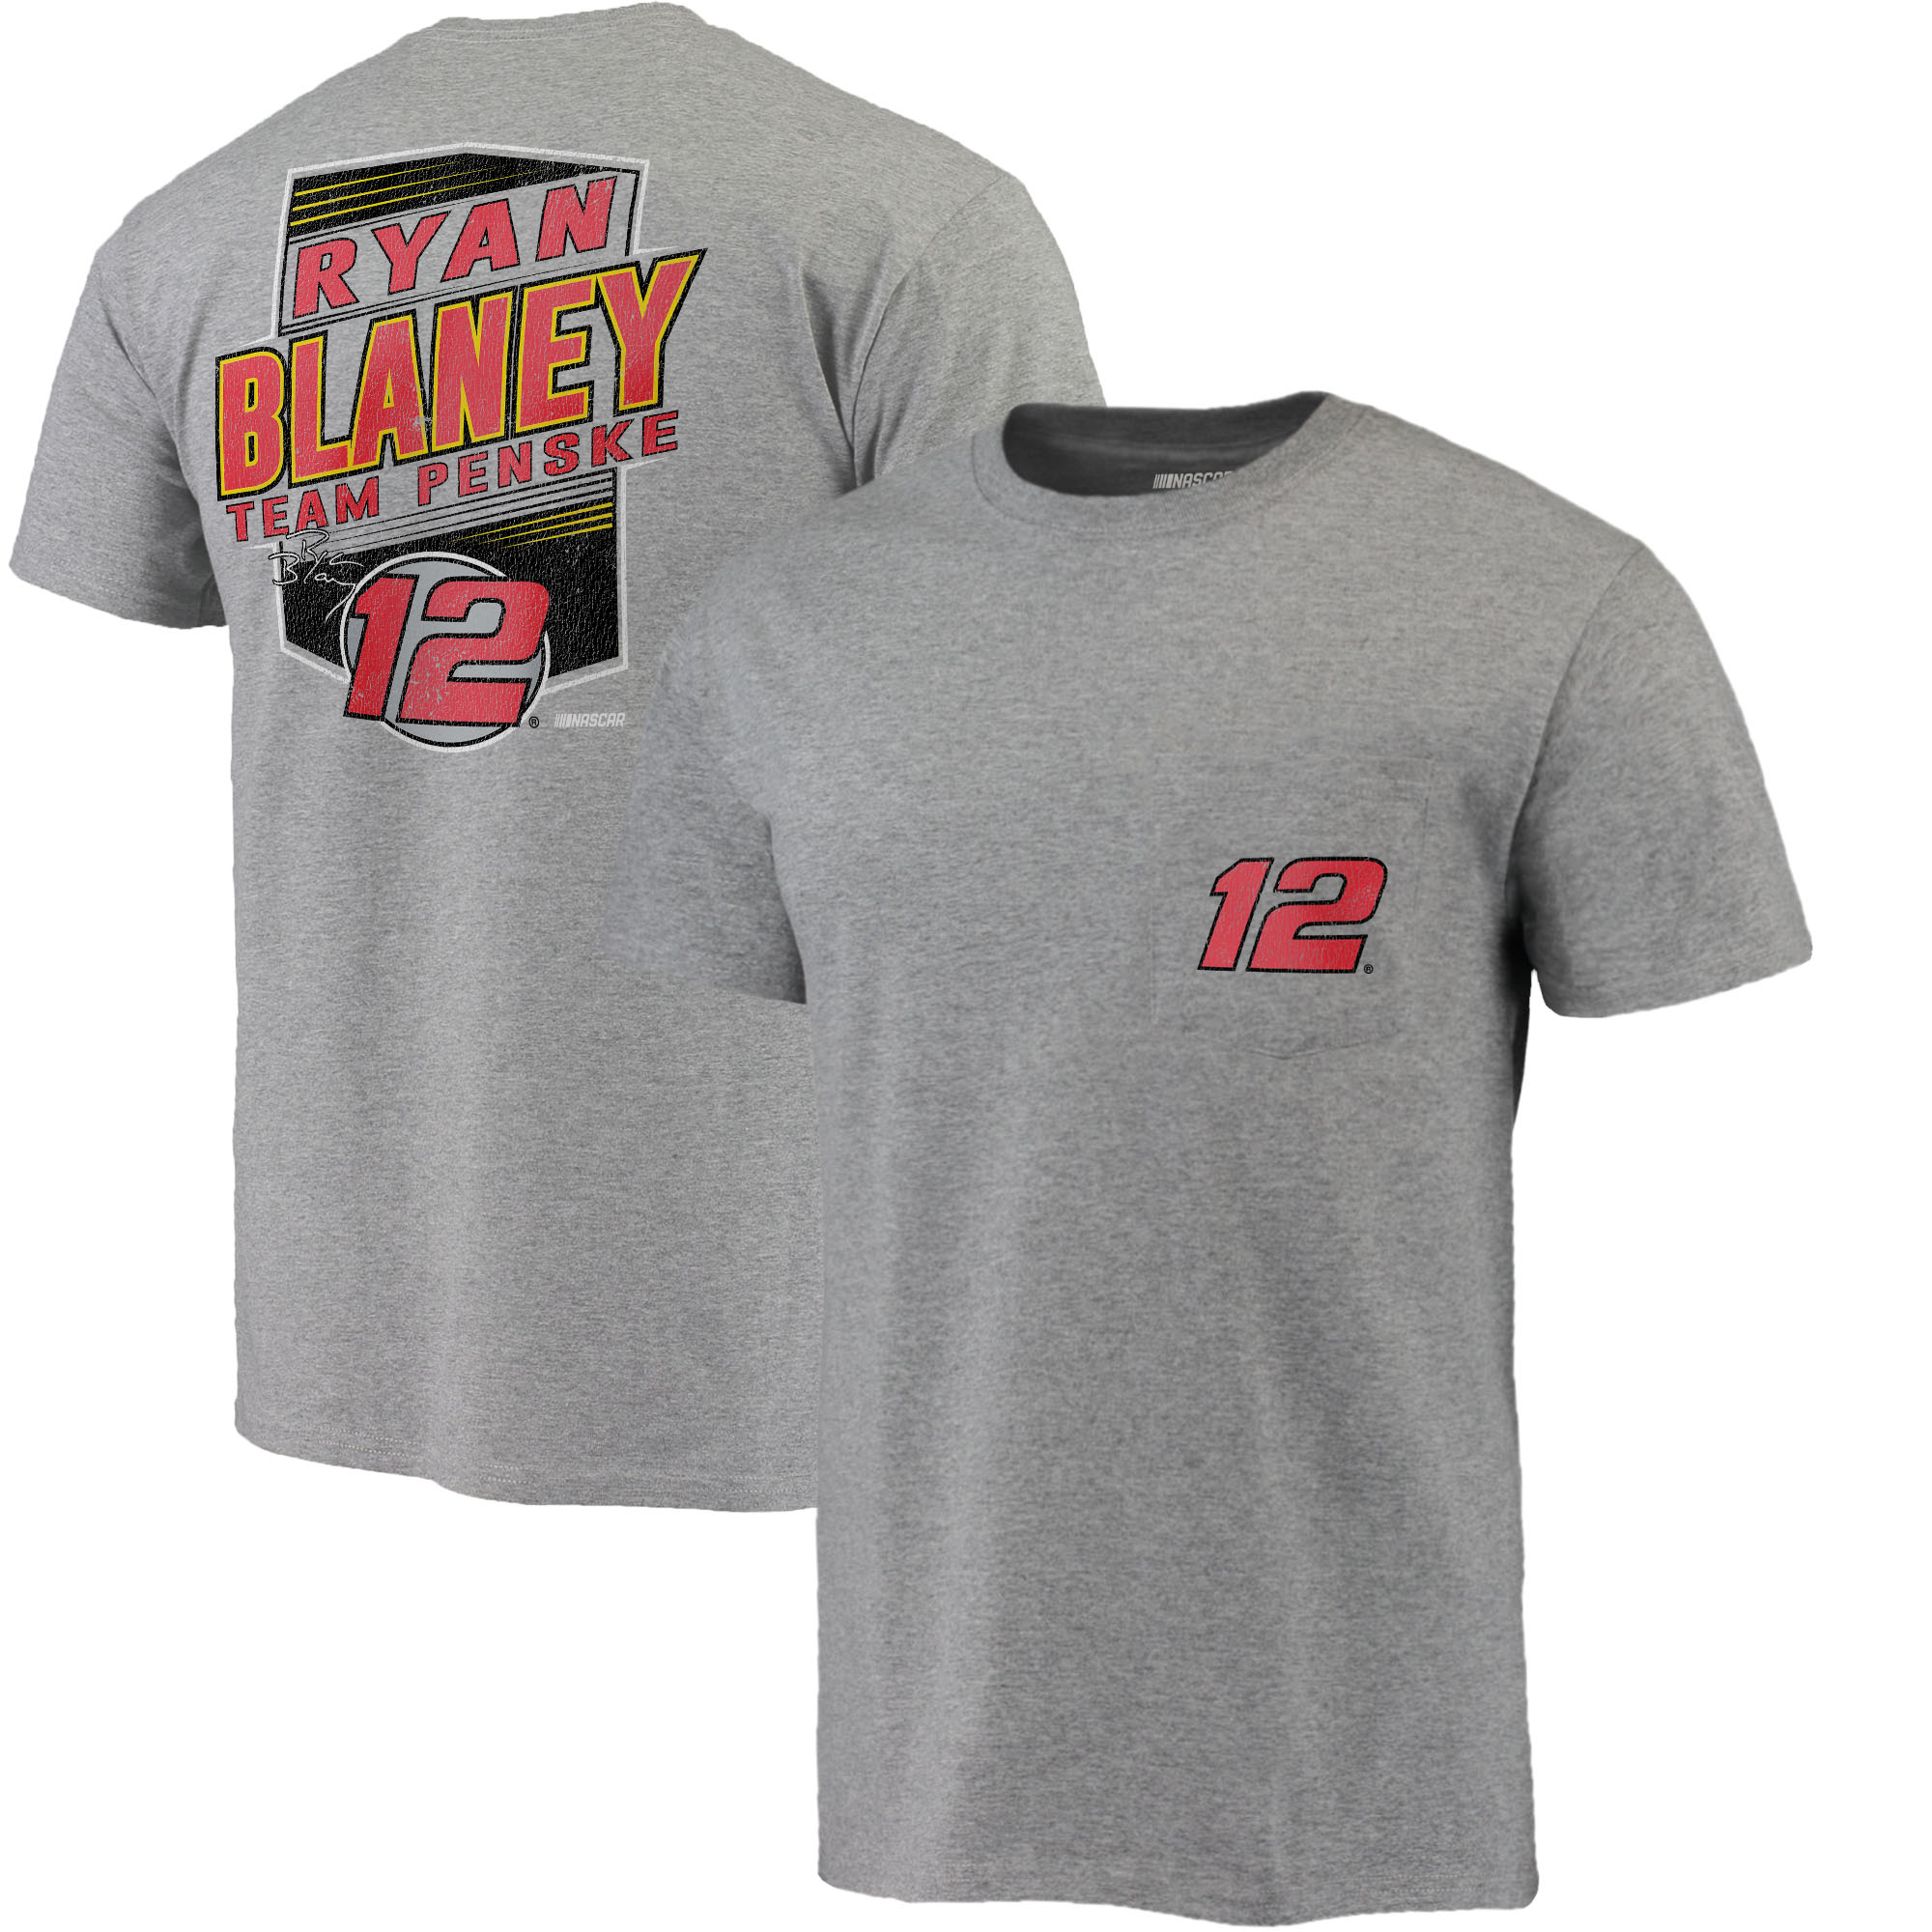 Ryan Blaney Fanatics Branded Pocket T-Shirt - Heather Gray